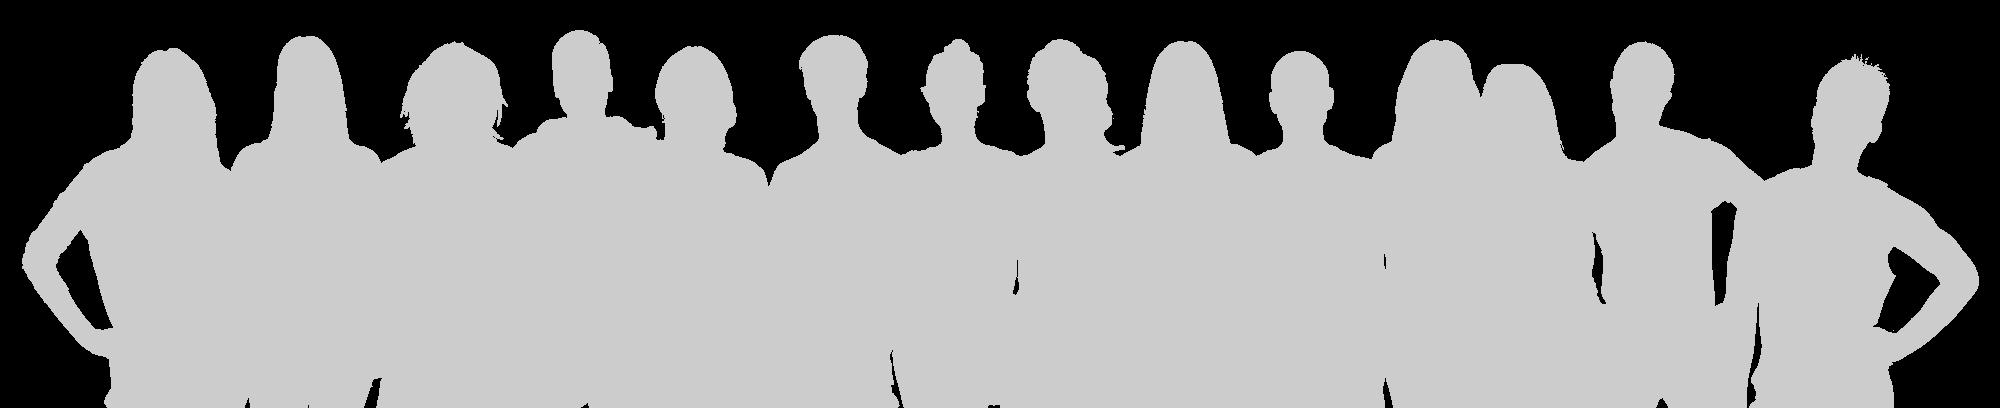 the bangsexting team